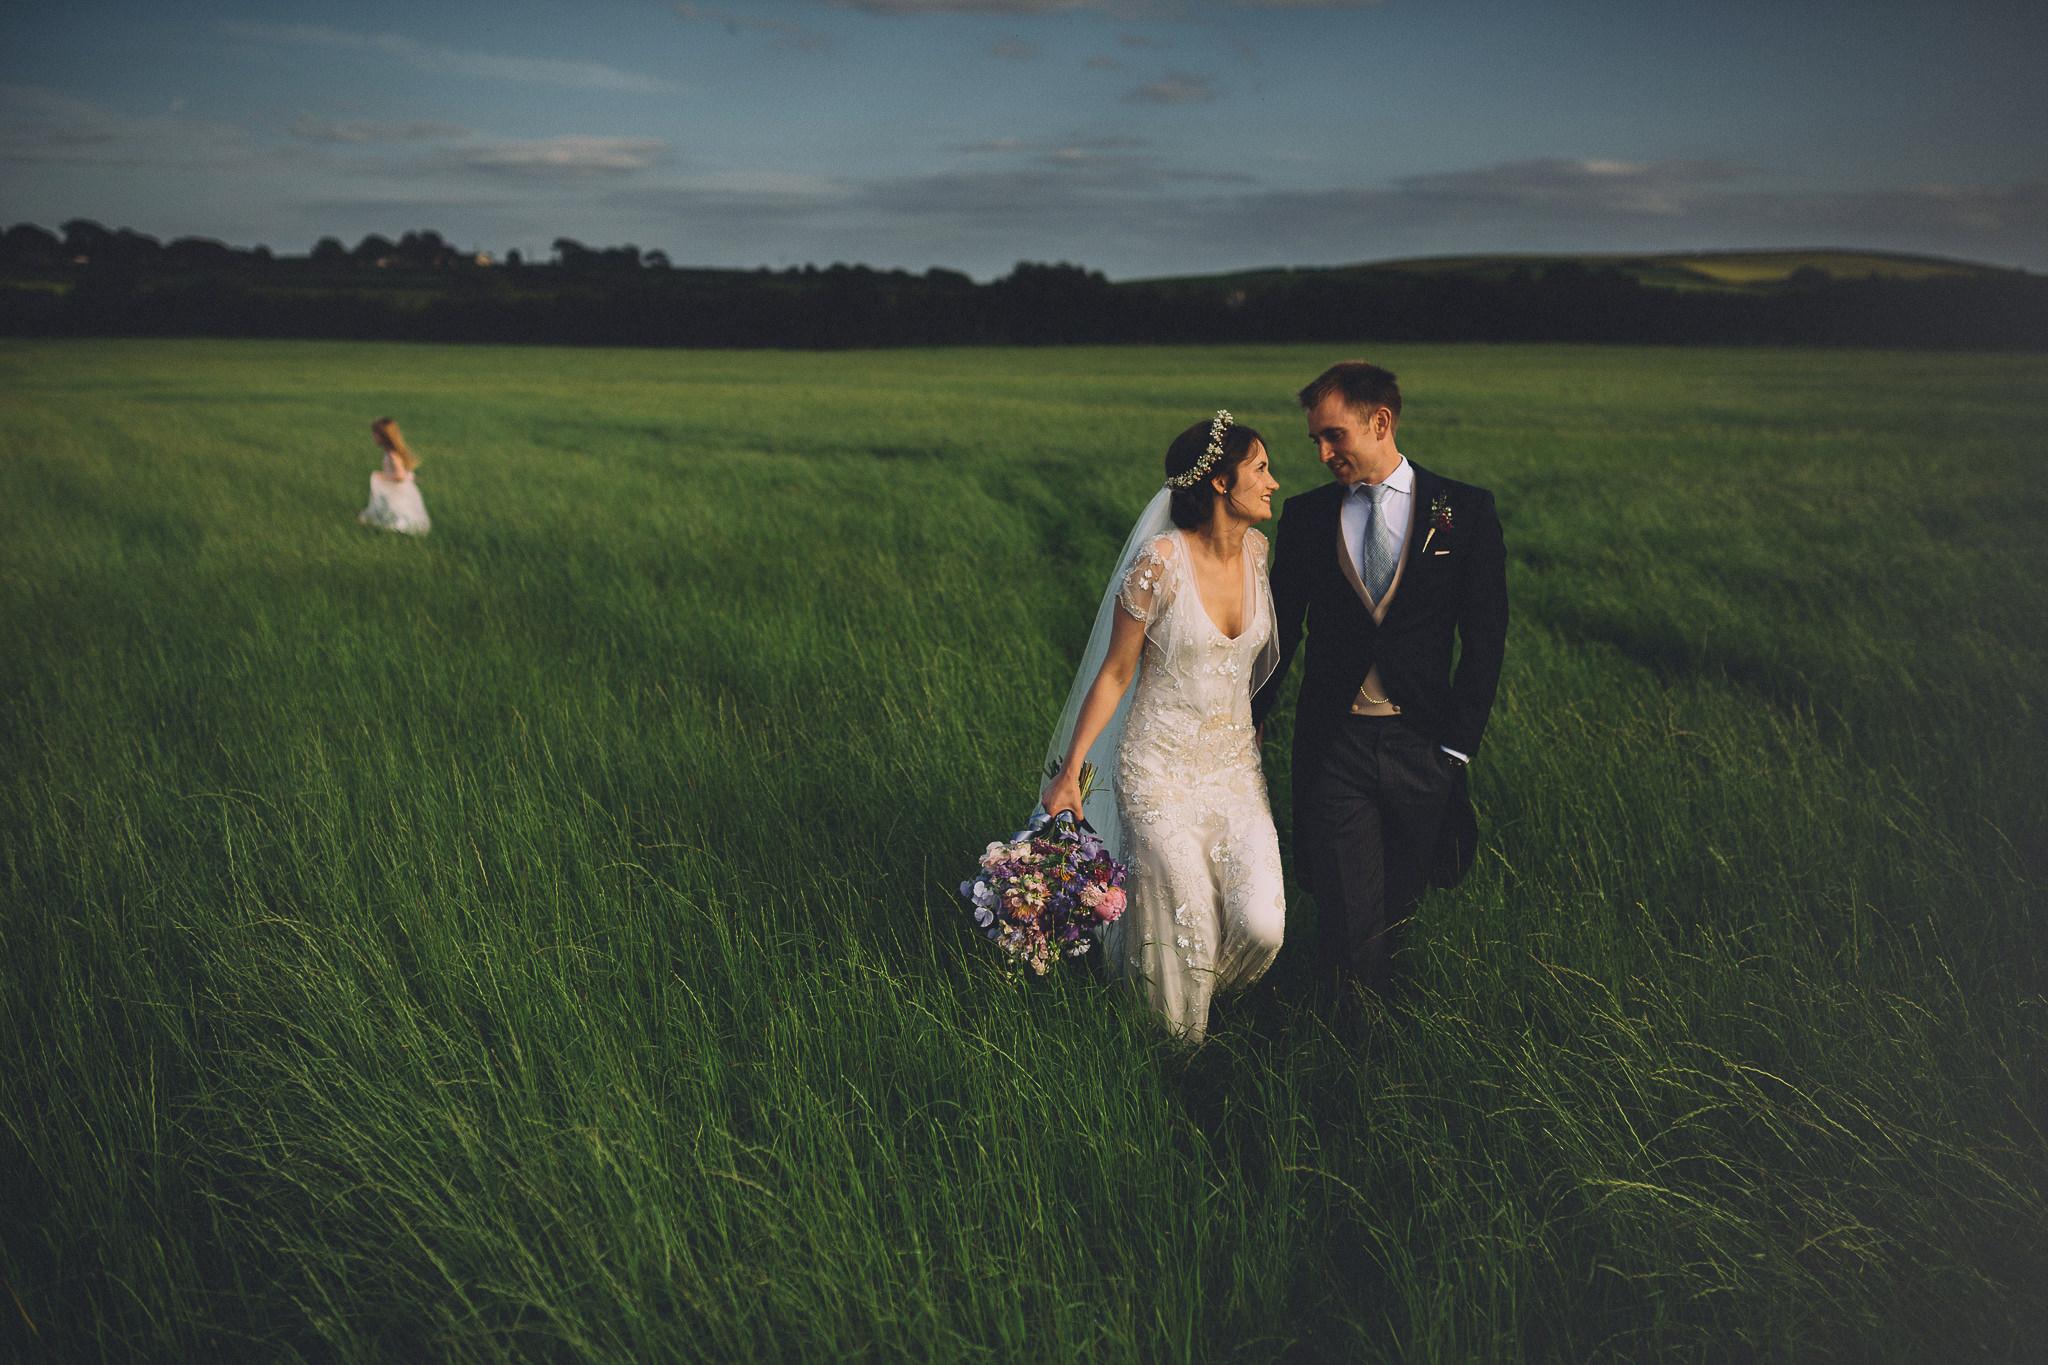 paul-marbrook-Farm-Wedding-Photographer-Lancashire-90067